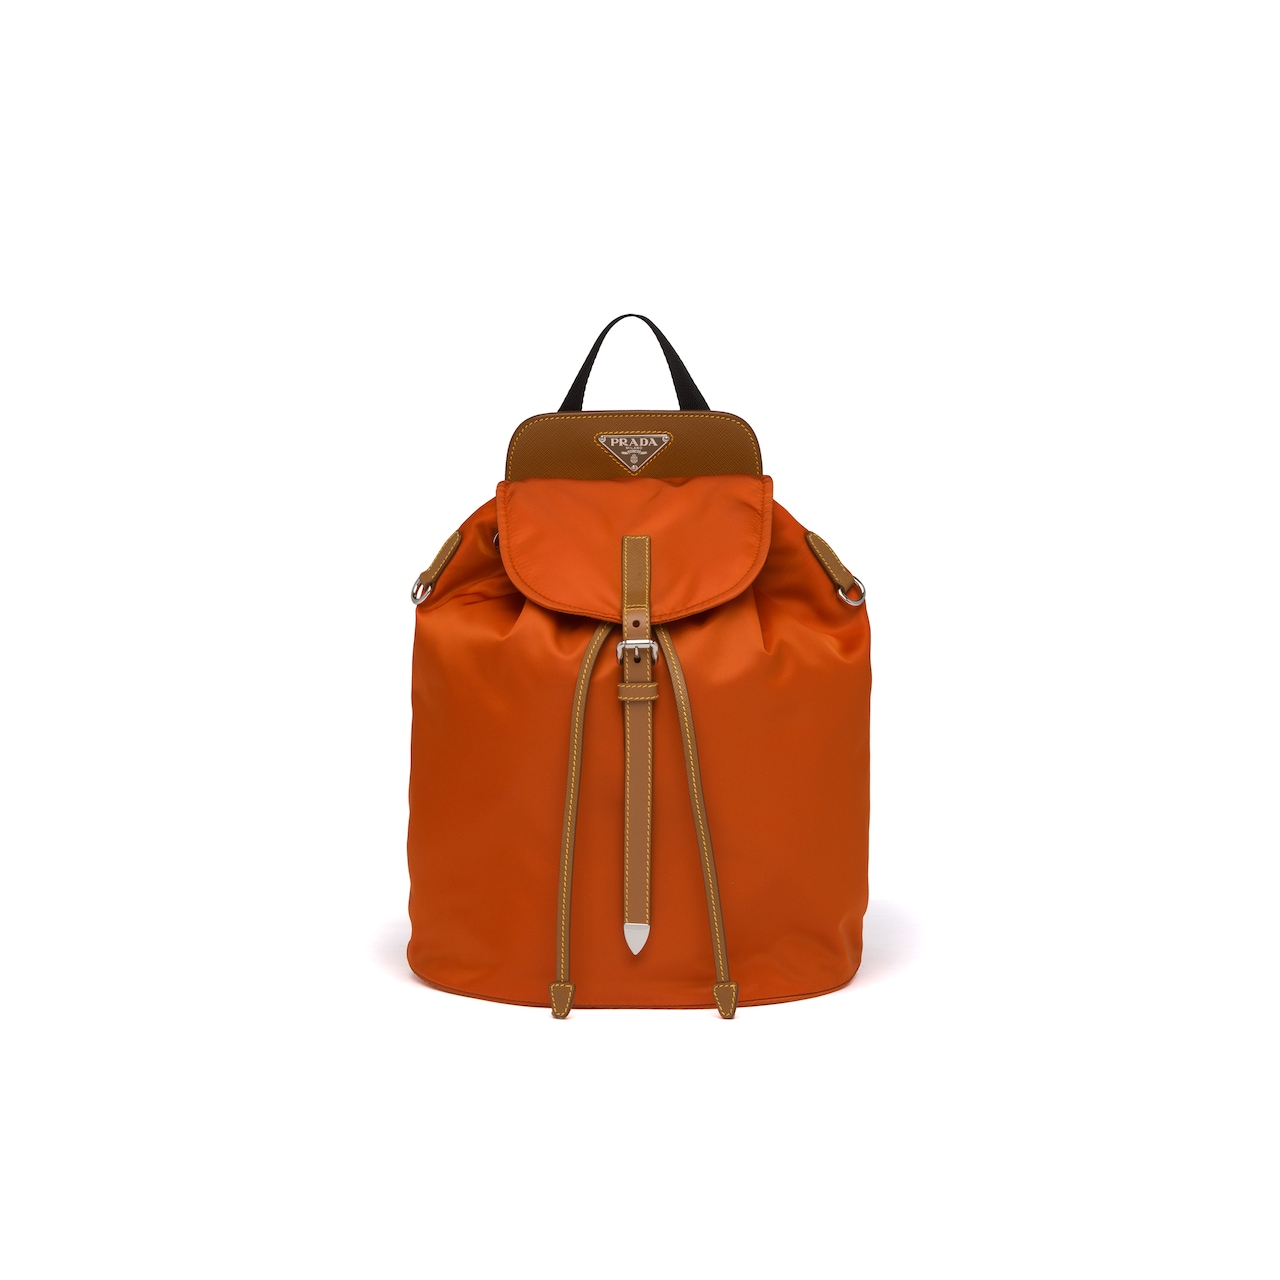 Prada Nylon and Saffiano leather backpack 1